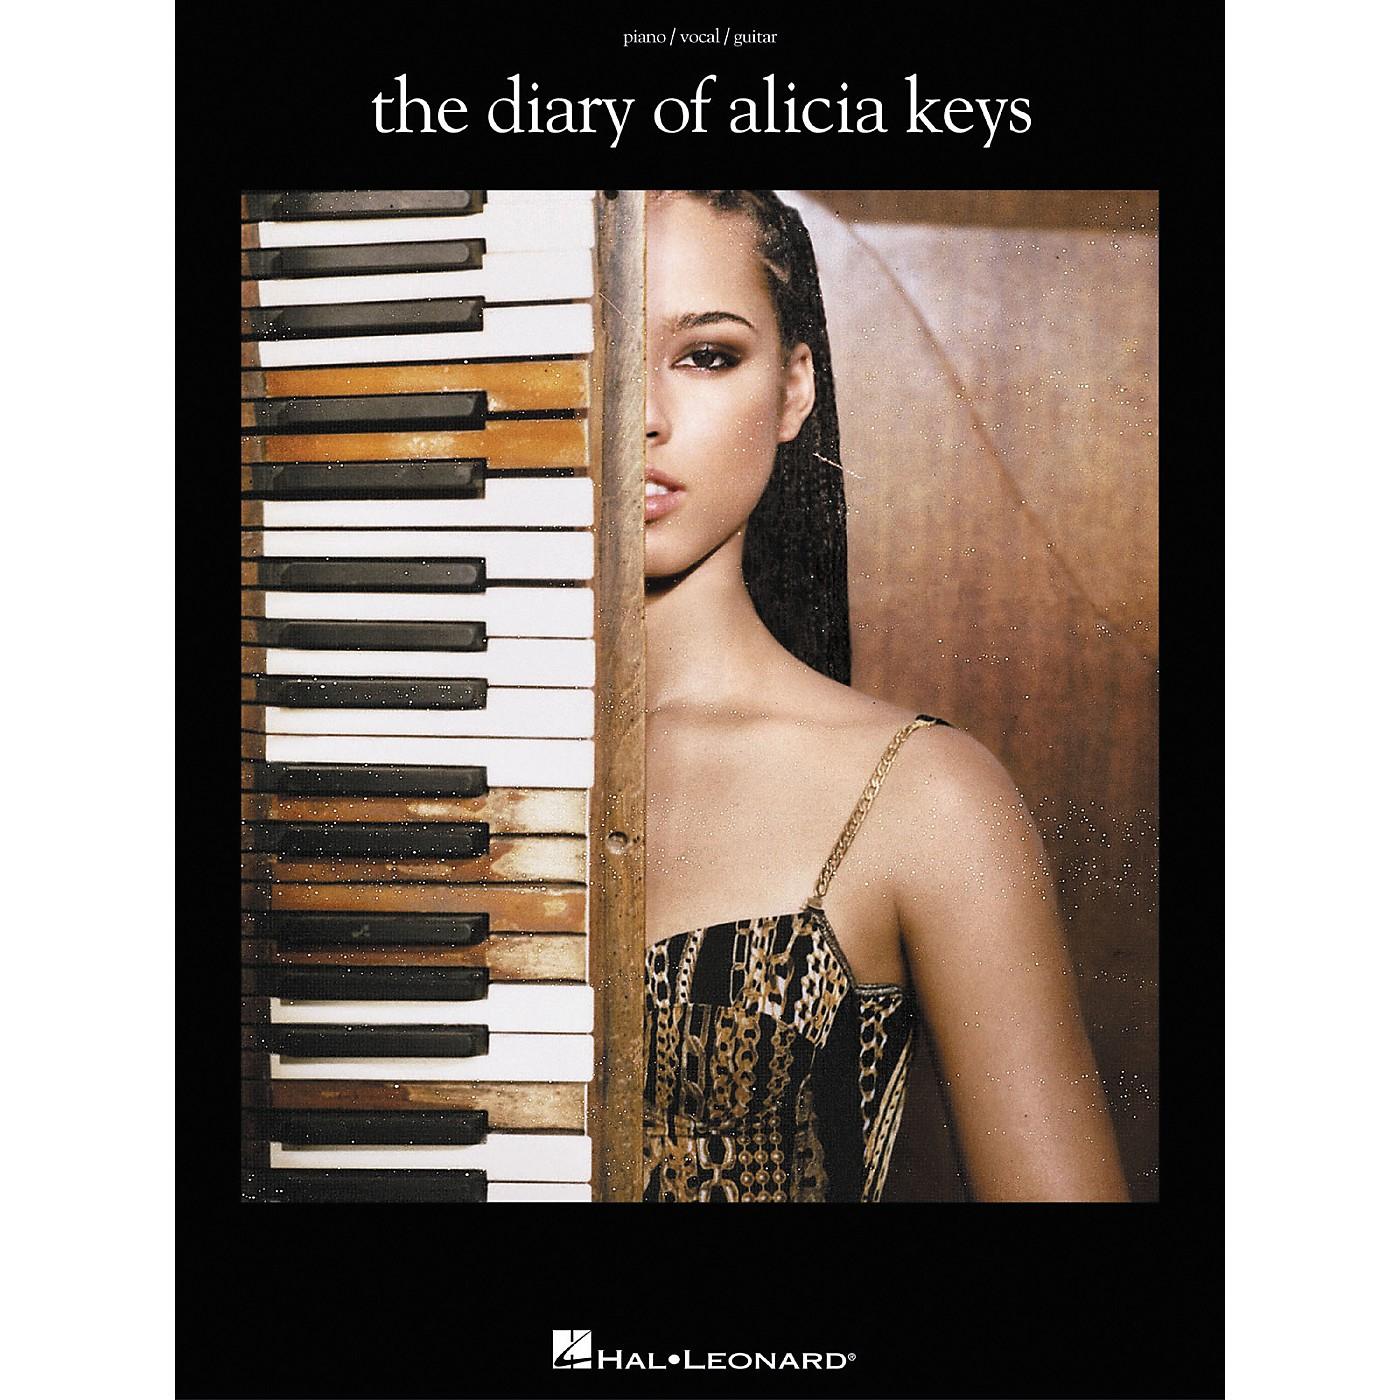 Hal Leonard The Diary of Alicia Keys Piano, Vocal, Guitar Songbook thumbnail